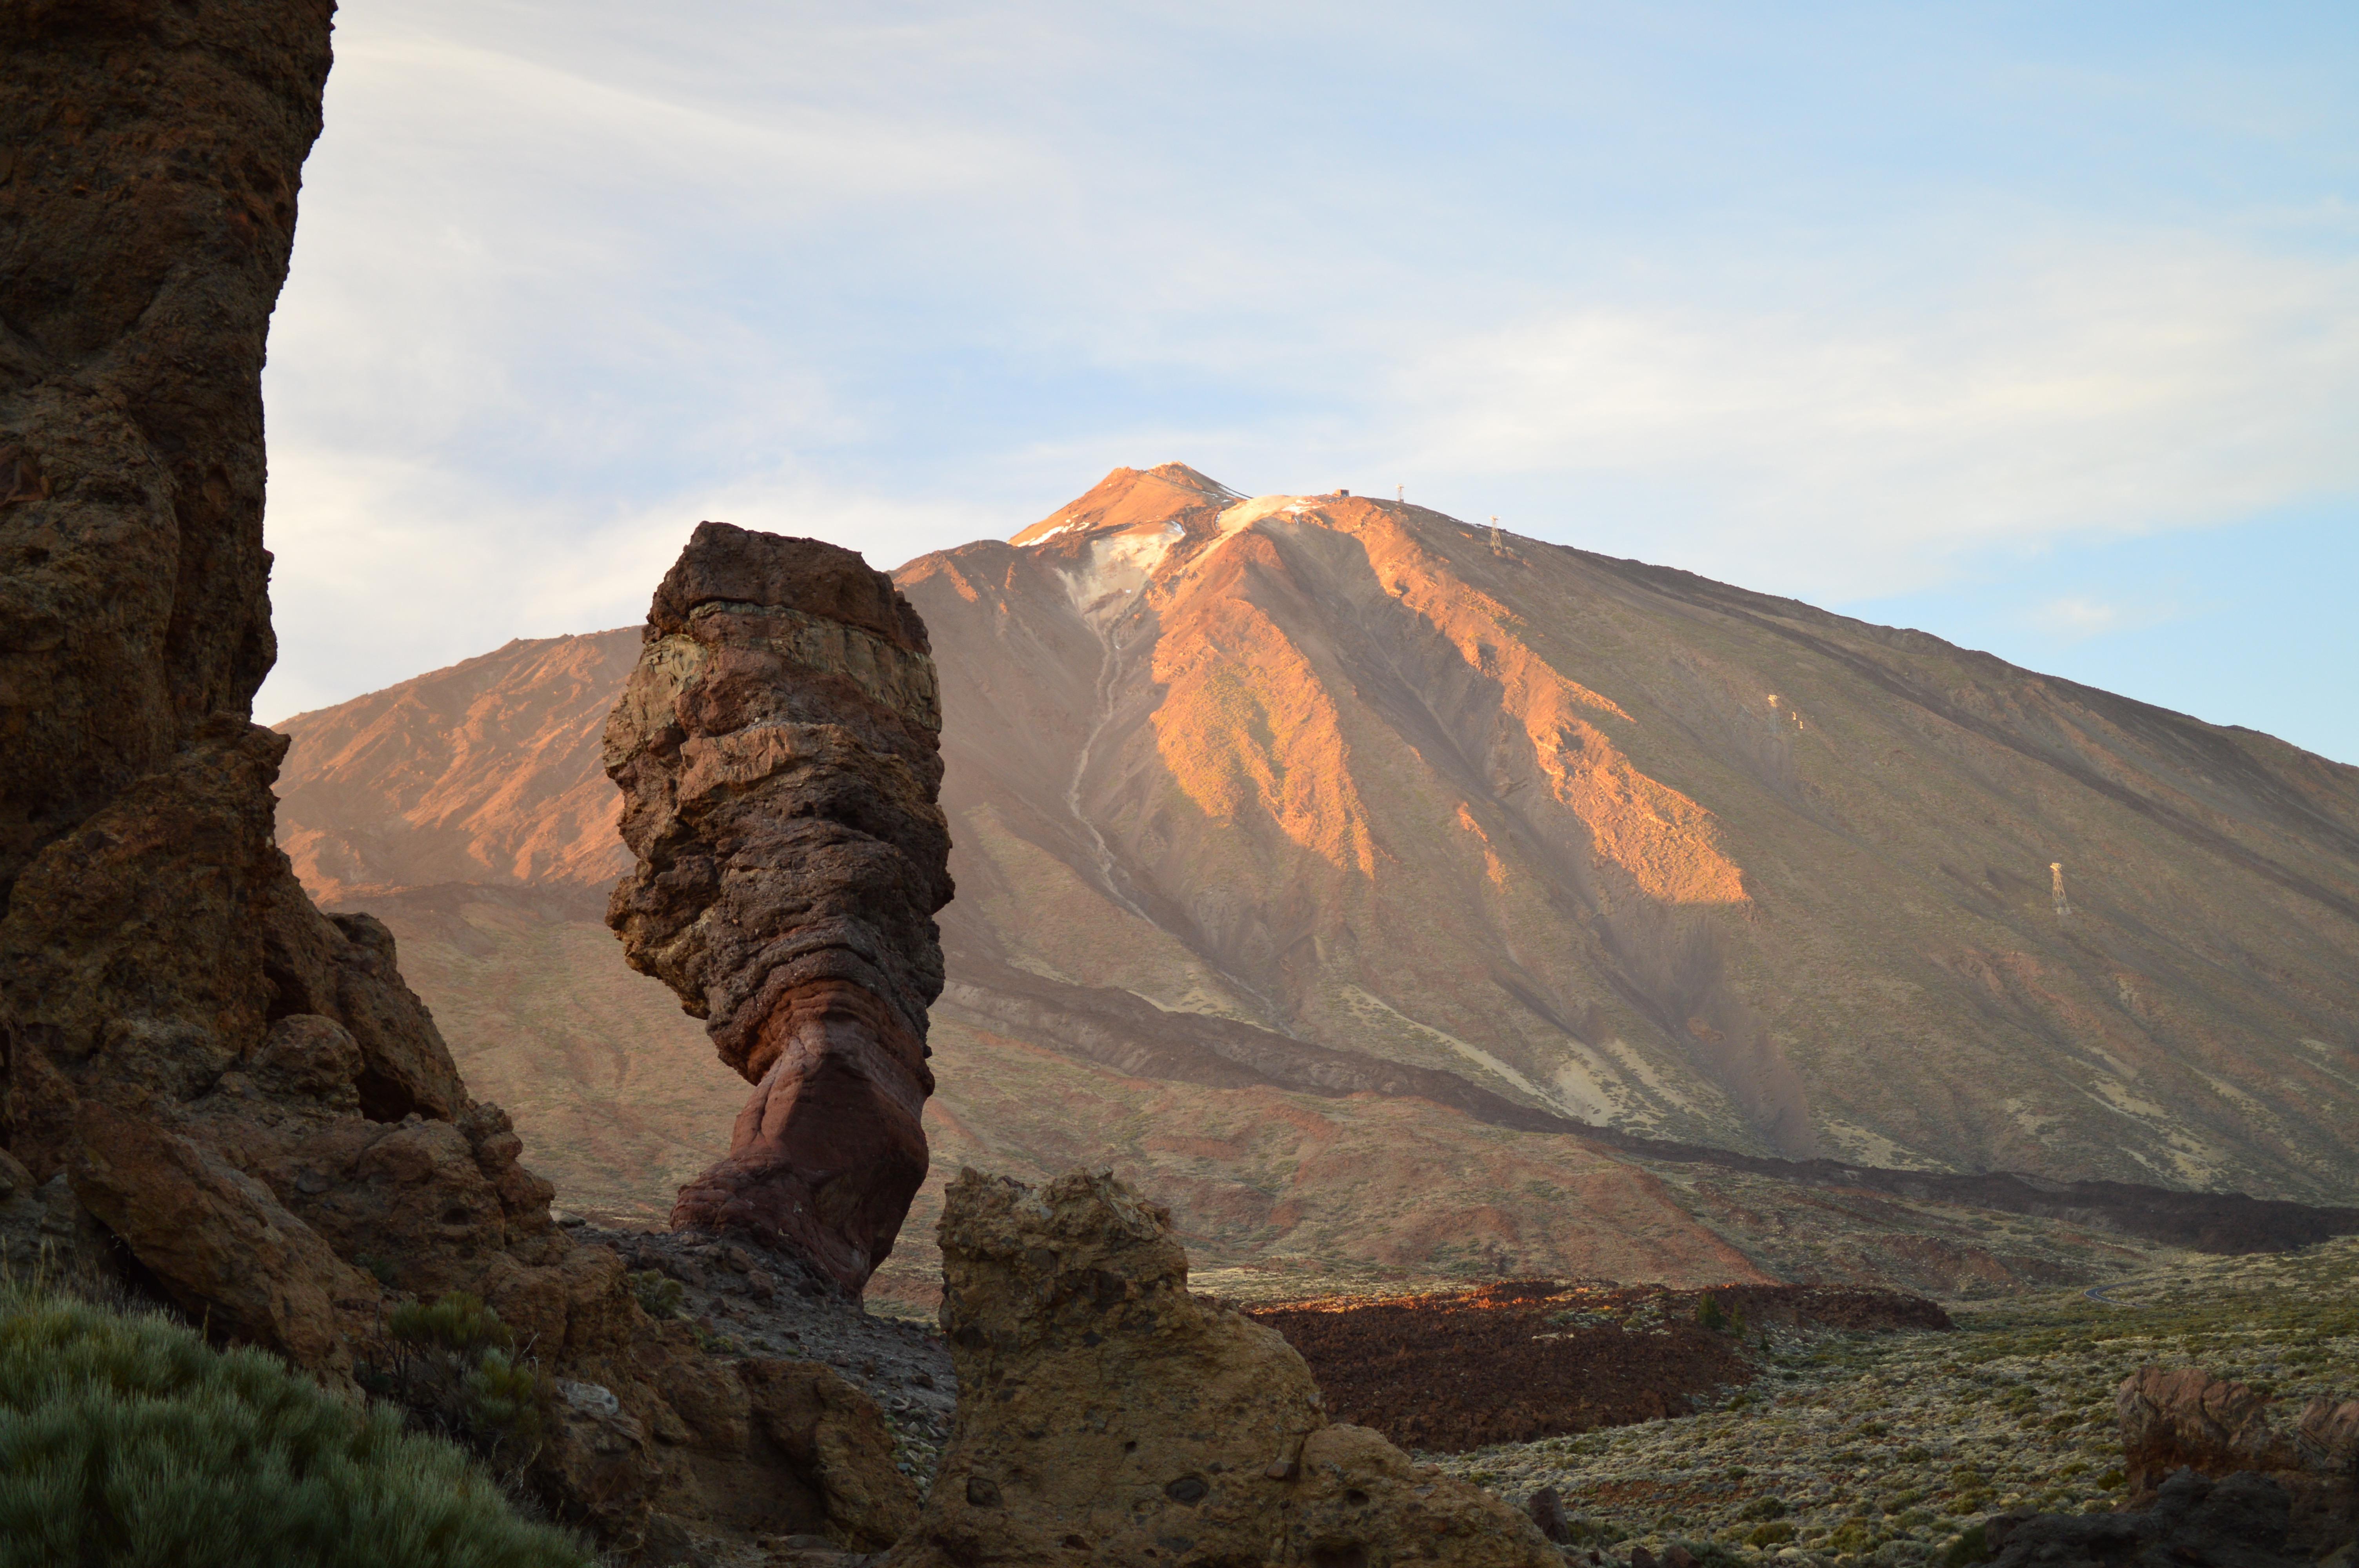 Teide, Tenerife, Spain